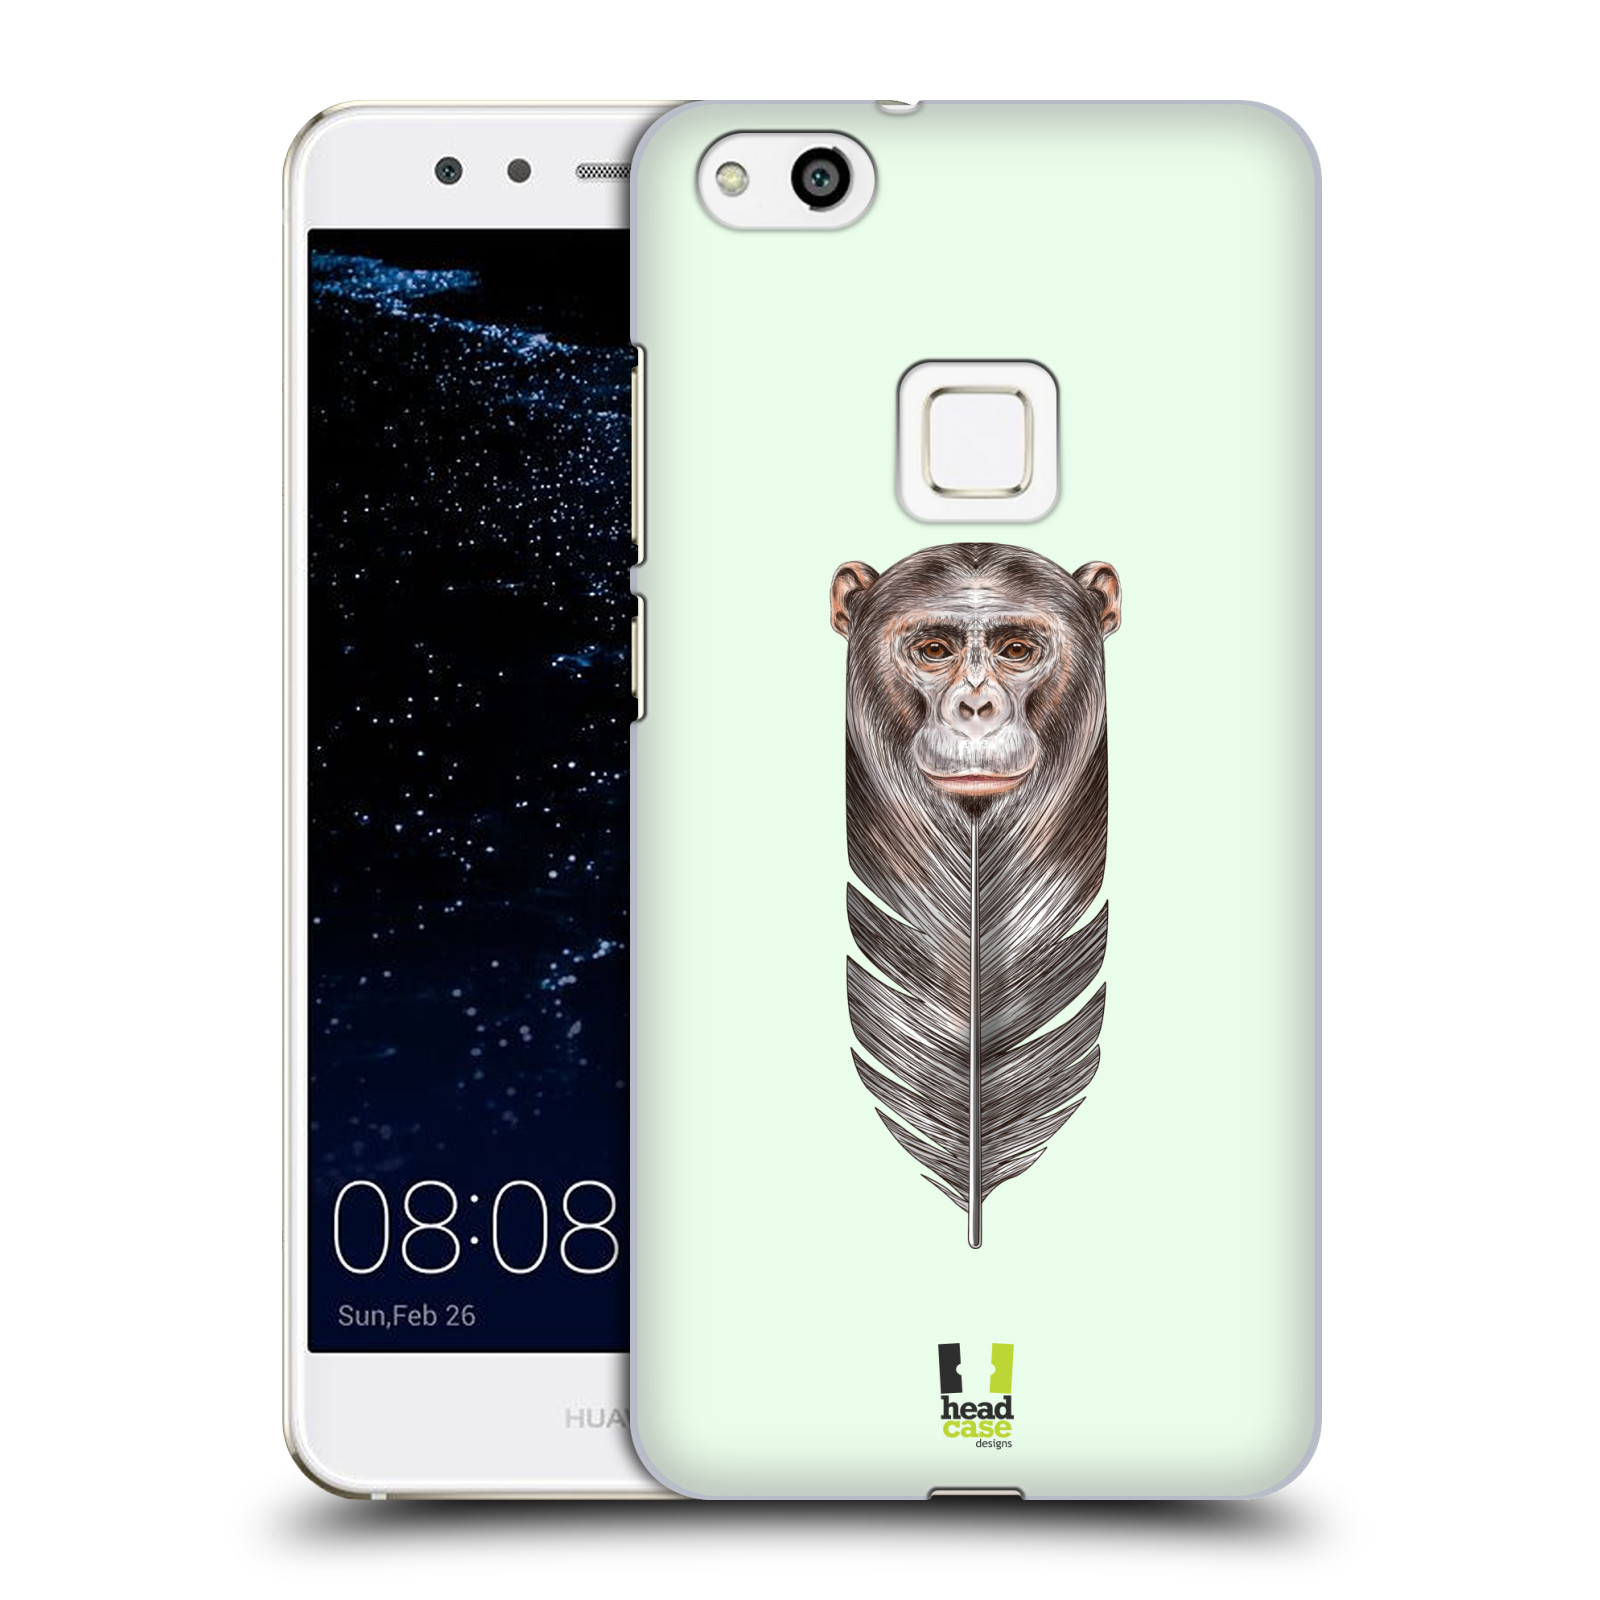 Plastové pouzdro na mobil Huawei P10 Lite Head Case - PÍRKO OPIČKA (Plastový kryt či obal na mobilní telefon Huawei P10 Lite Dual SIM (LX1/LX1A))